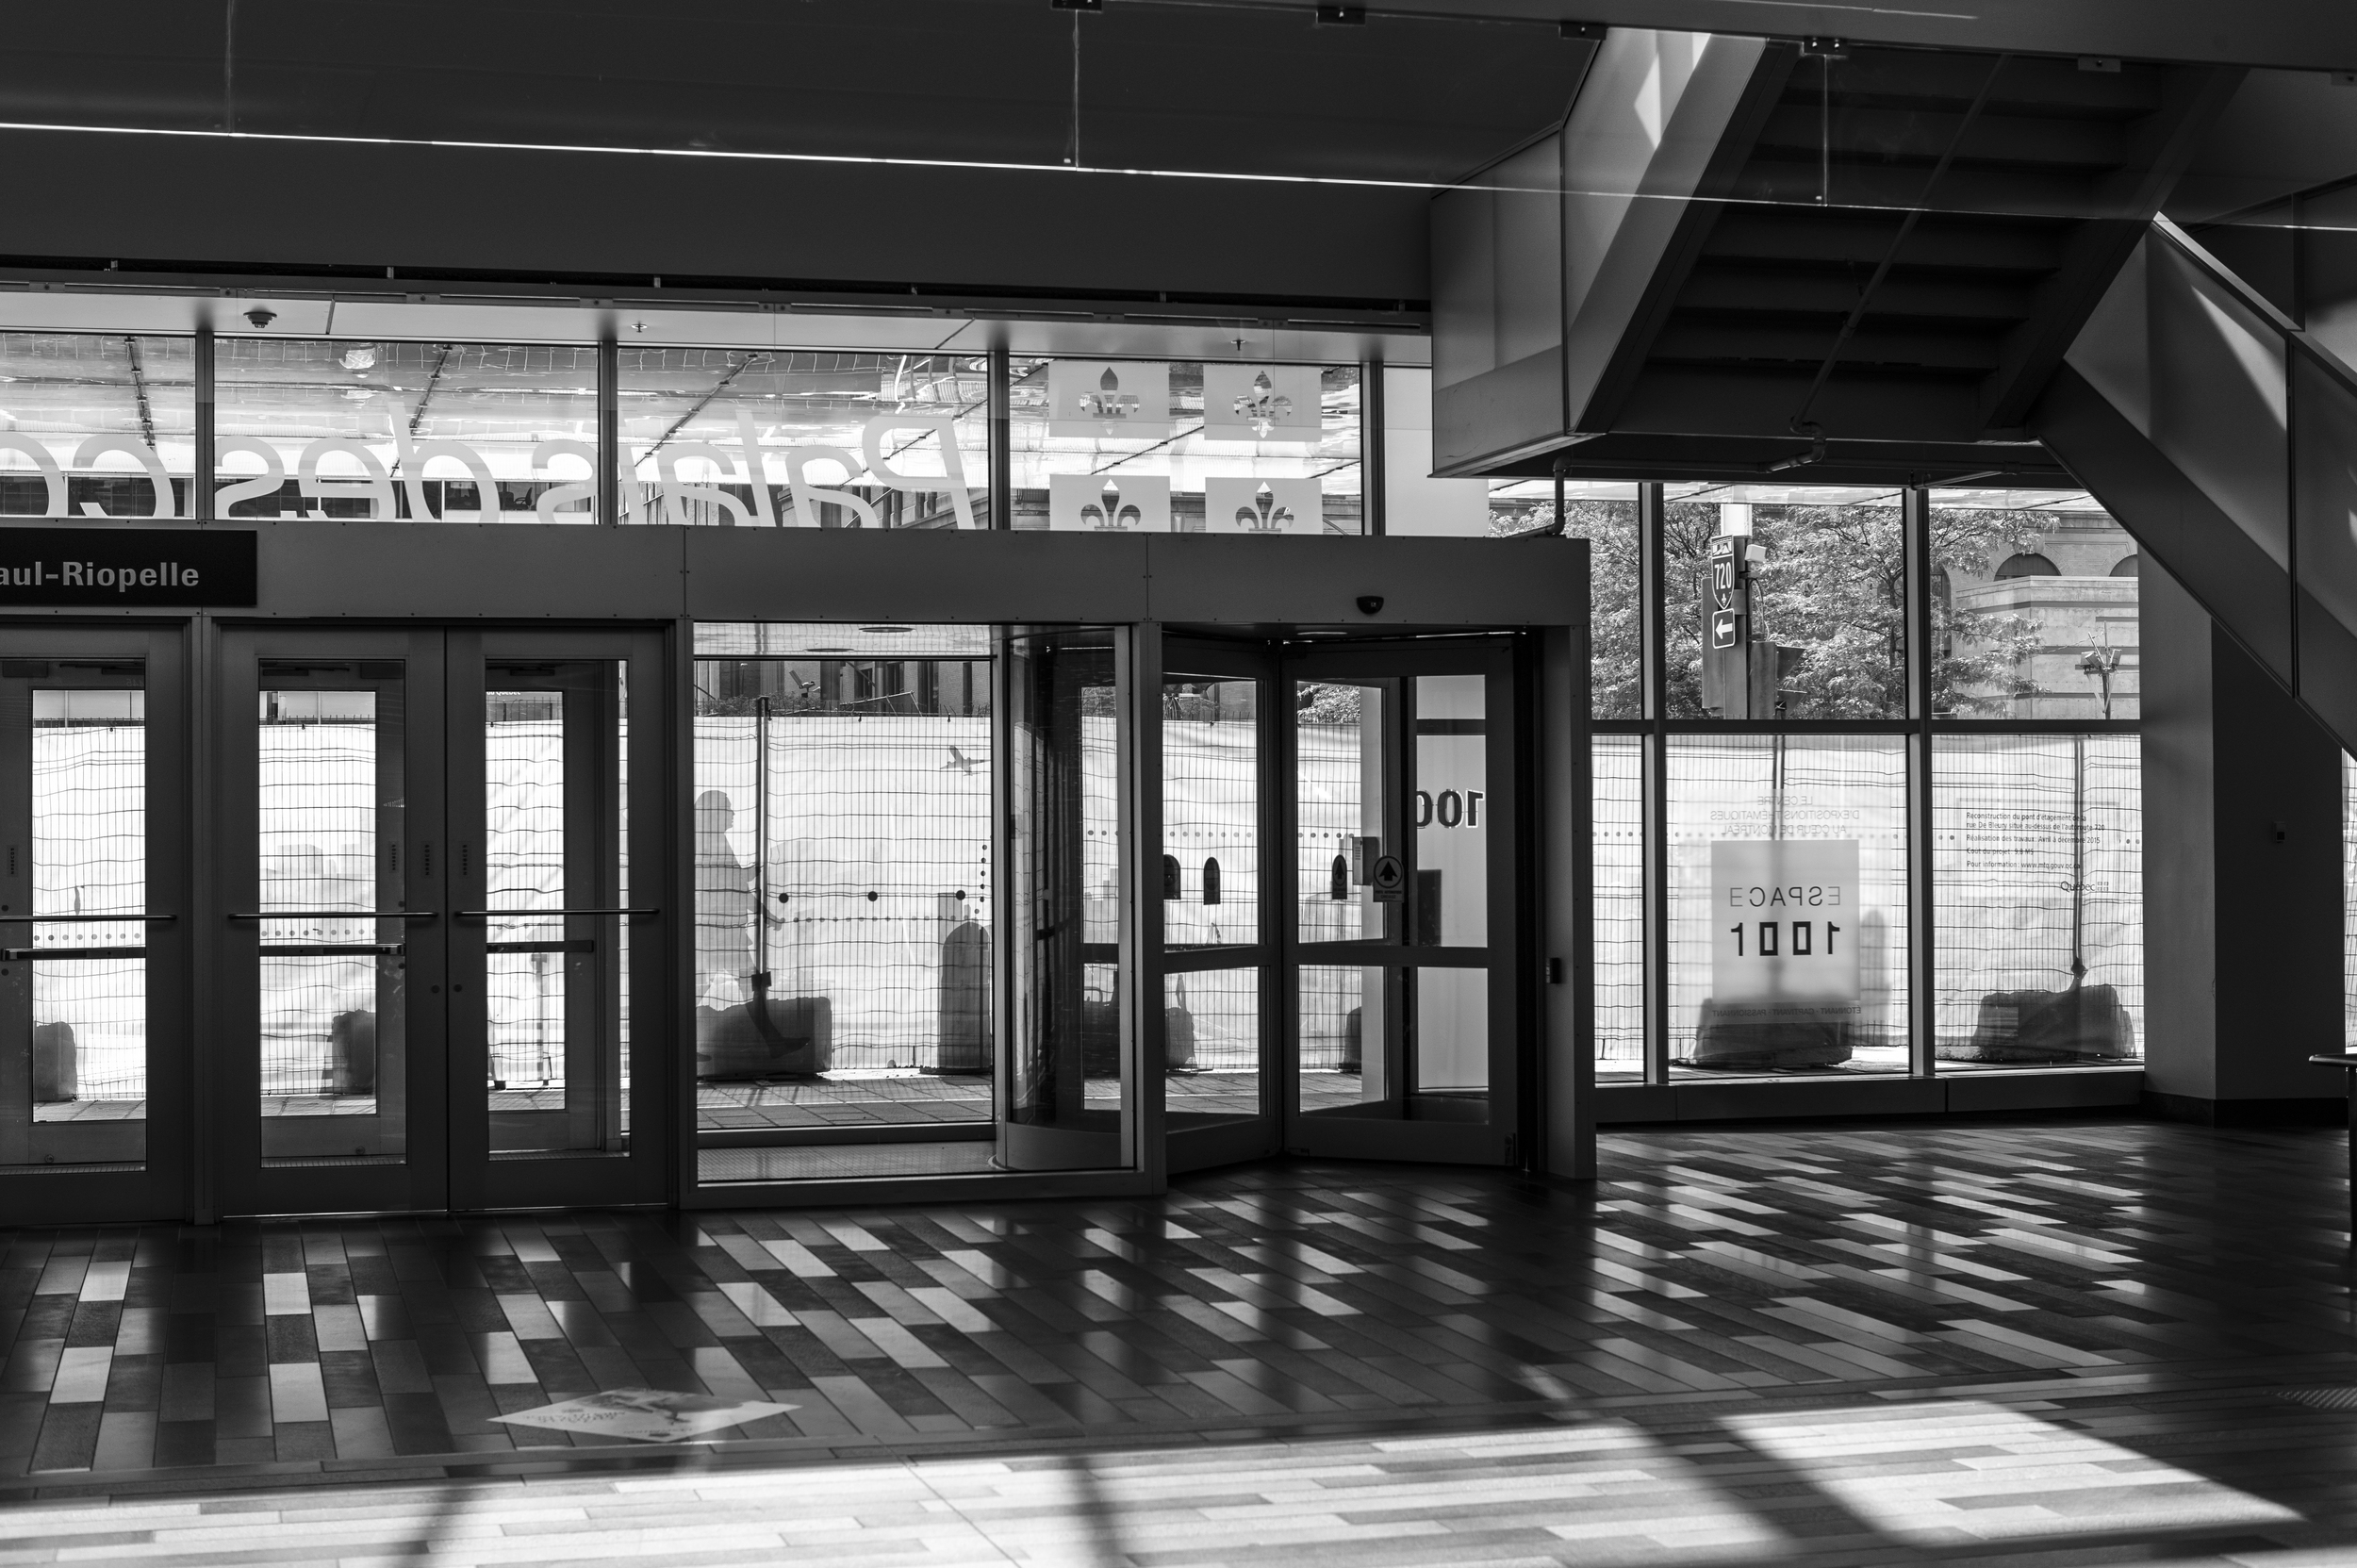 Leica Noctilux-M 50mm f/0.95 Lens Architectural Photography, Master Photographer Oz Yilmaz explains Architectural Photography in this Photography Tutorial.